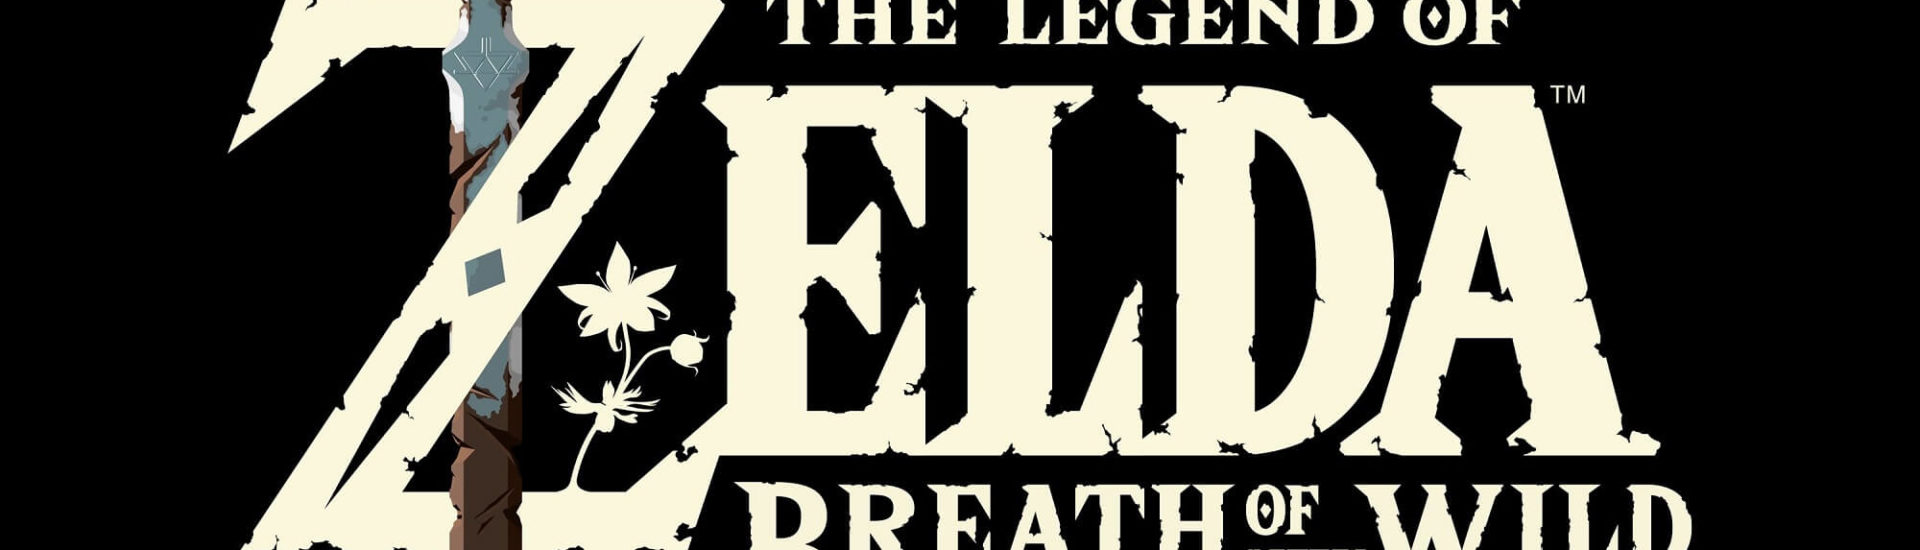 The Legend of Zelda Breath of the Wild: Links wilde Jagd durch die Openworld